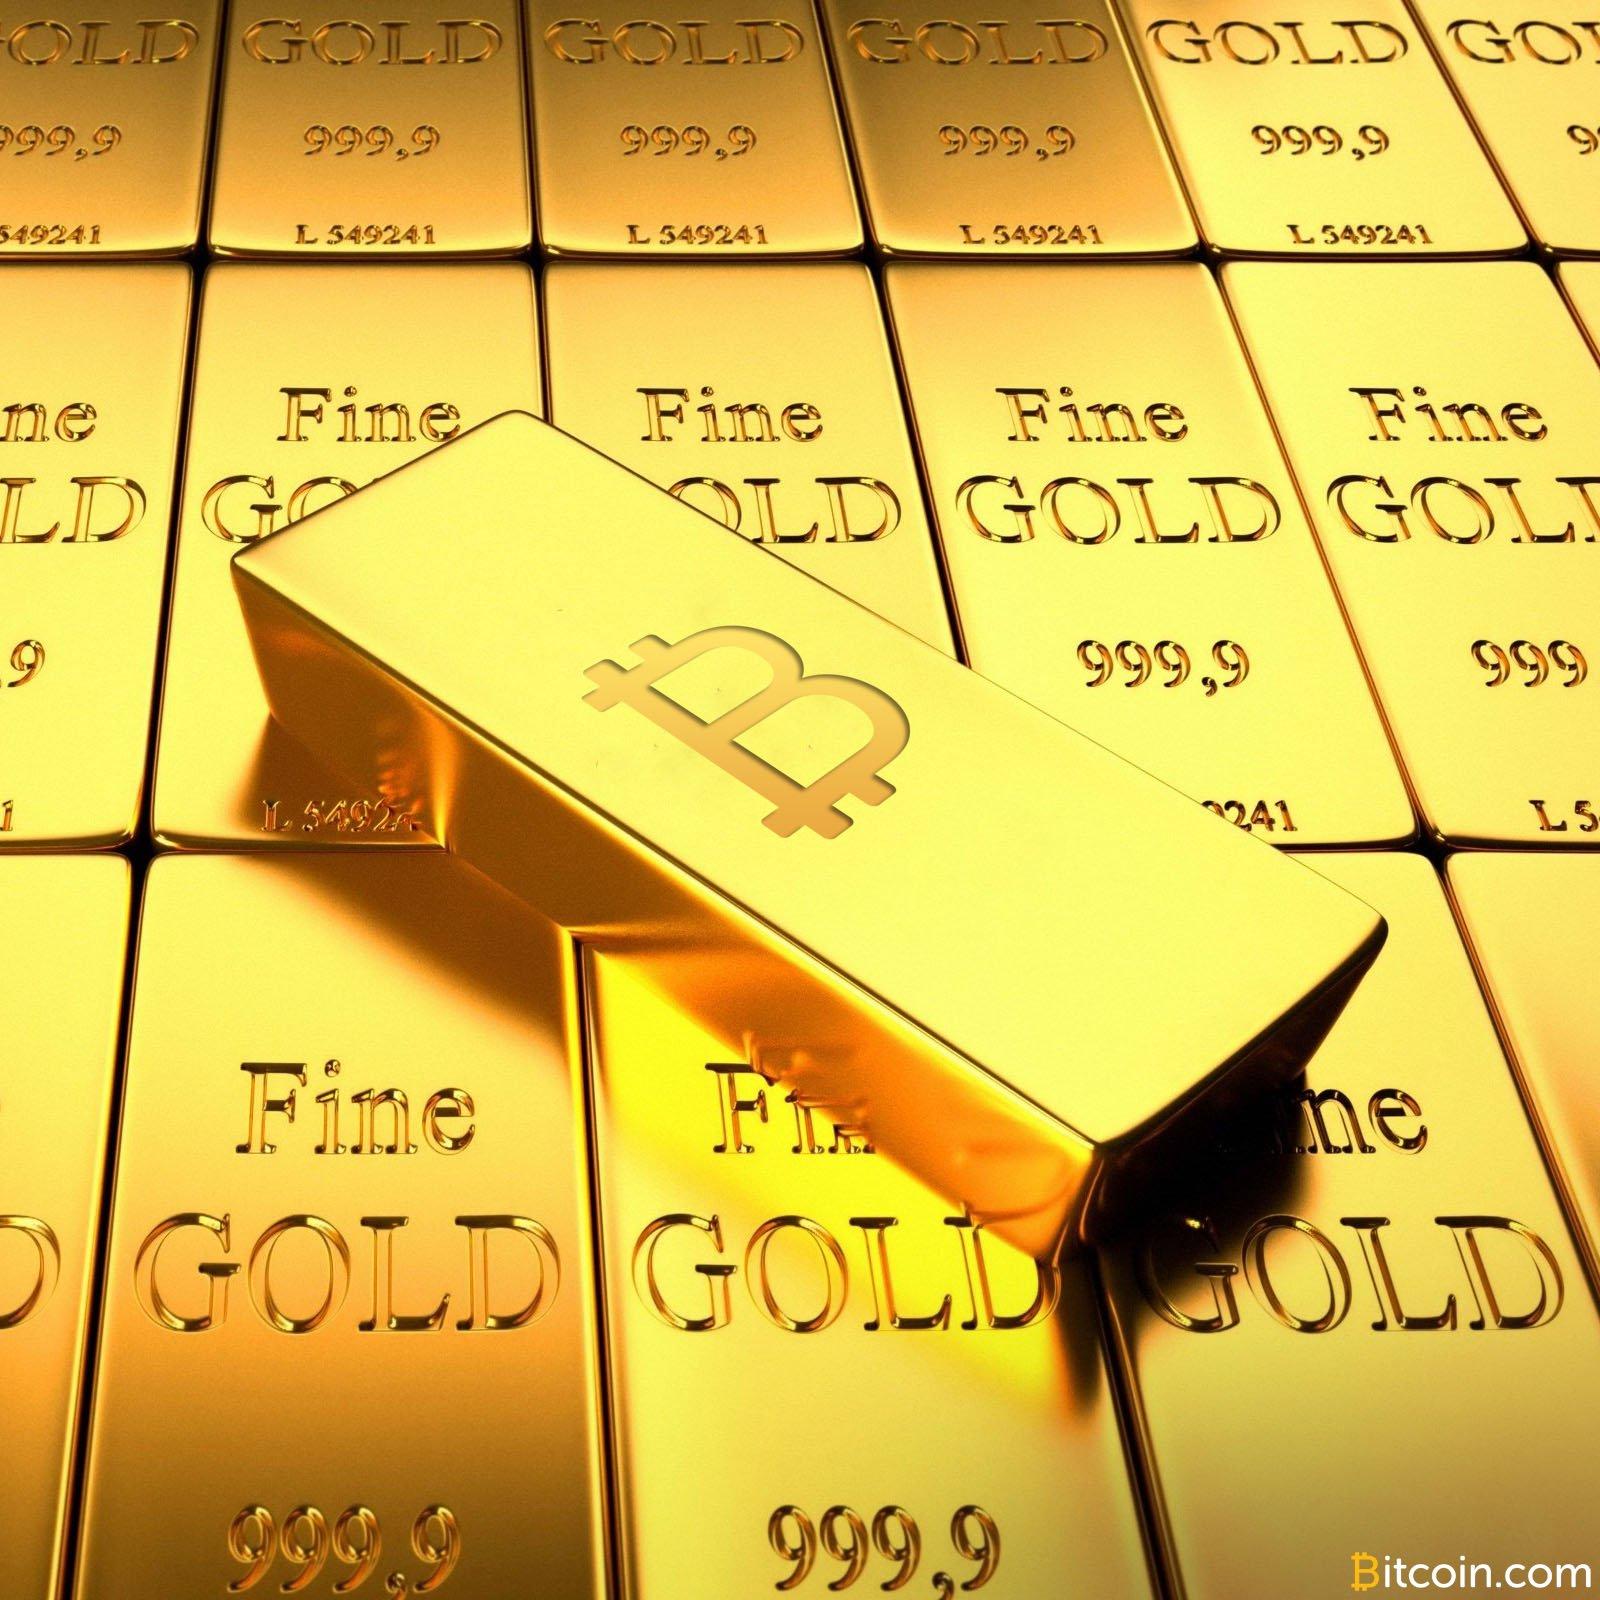 Gold-Versus-Bitcoin-Goldman-Sachs-Prefers-Metal-to-Crypto.jpg